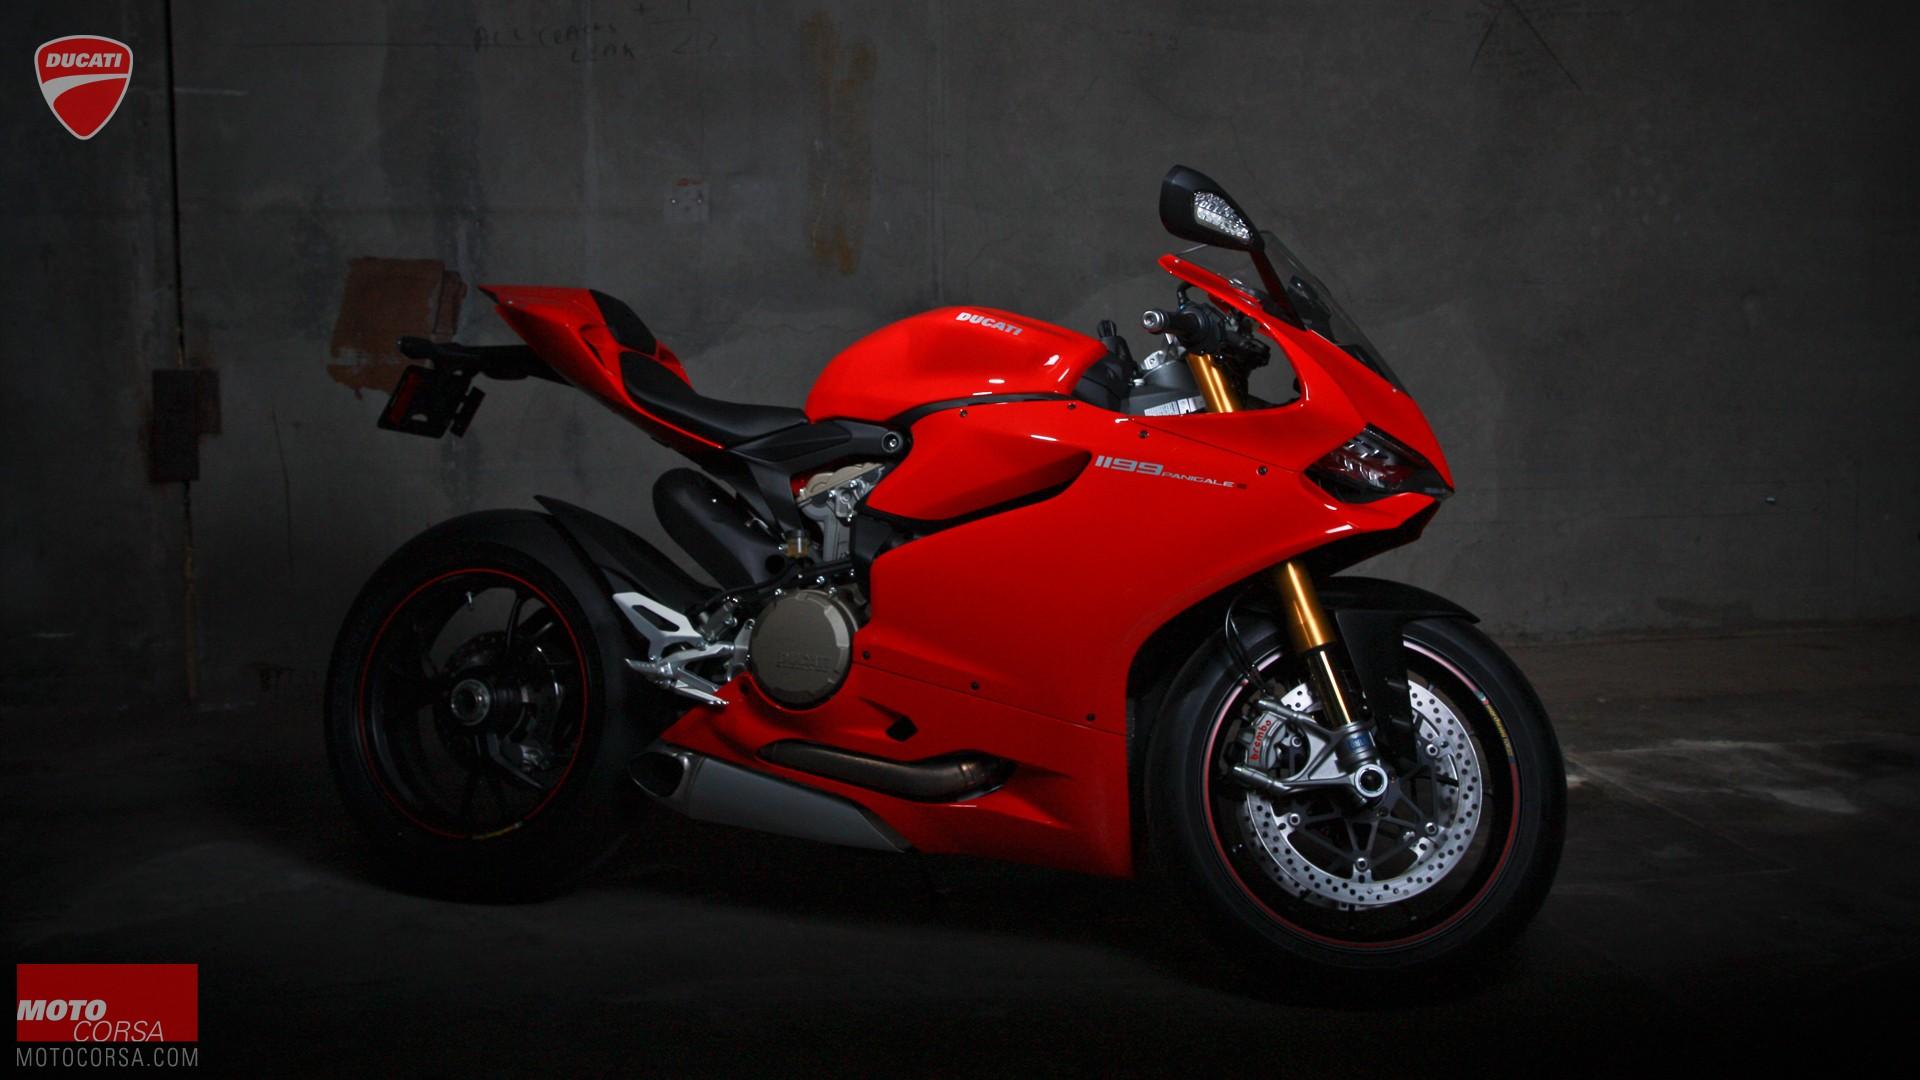 Ducati 1199 panigale #2